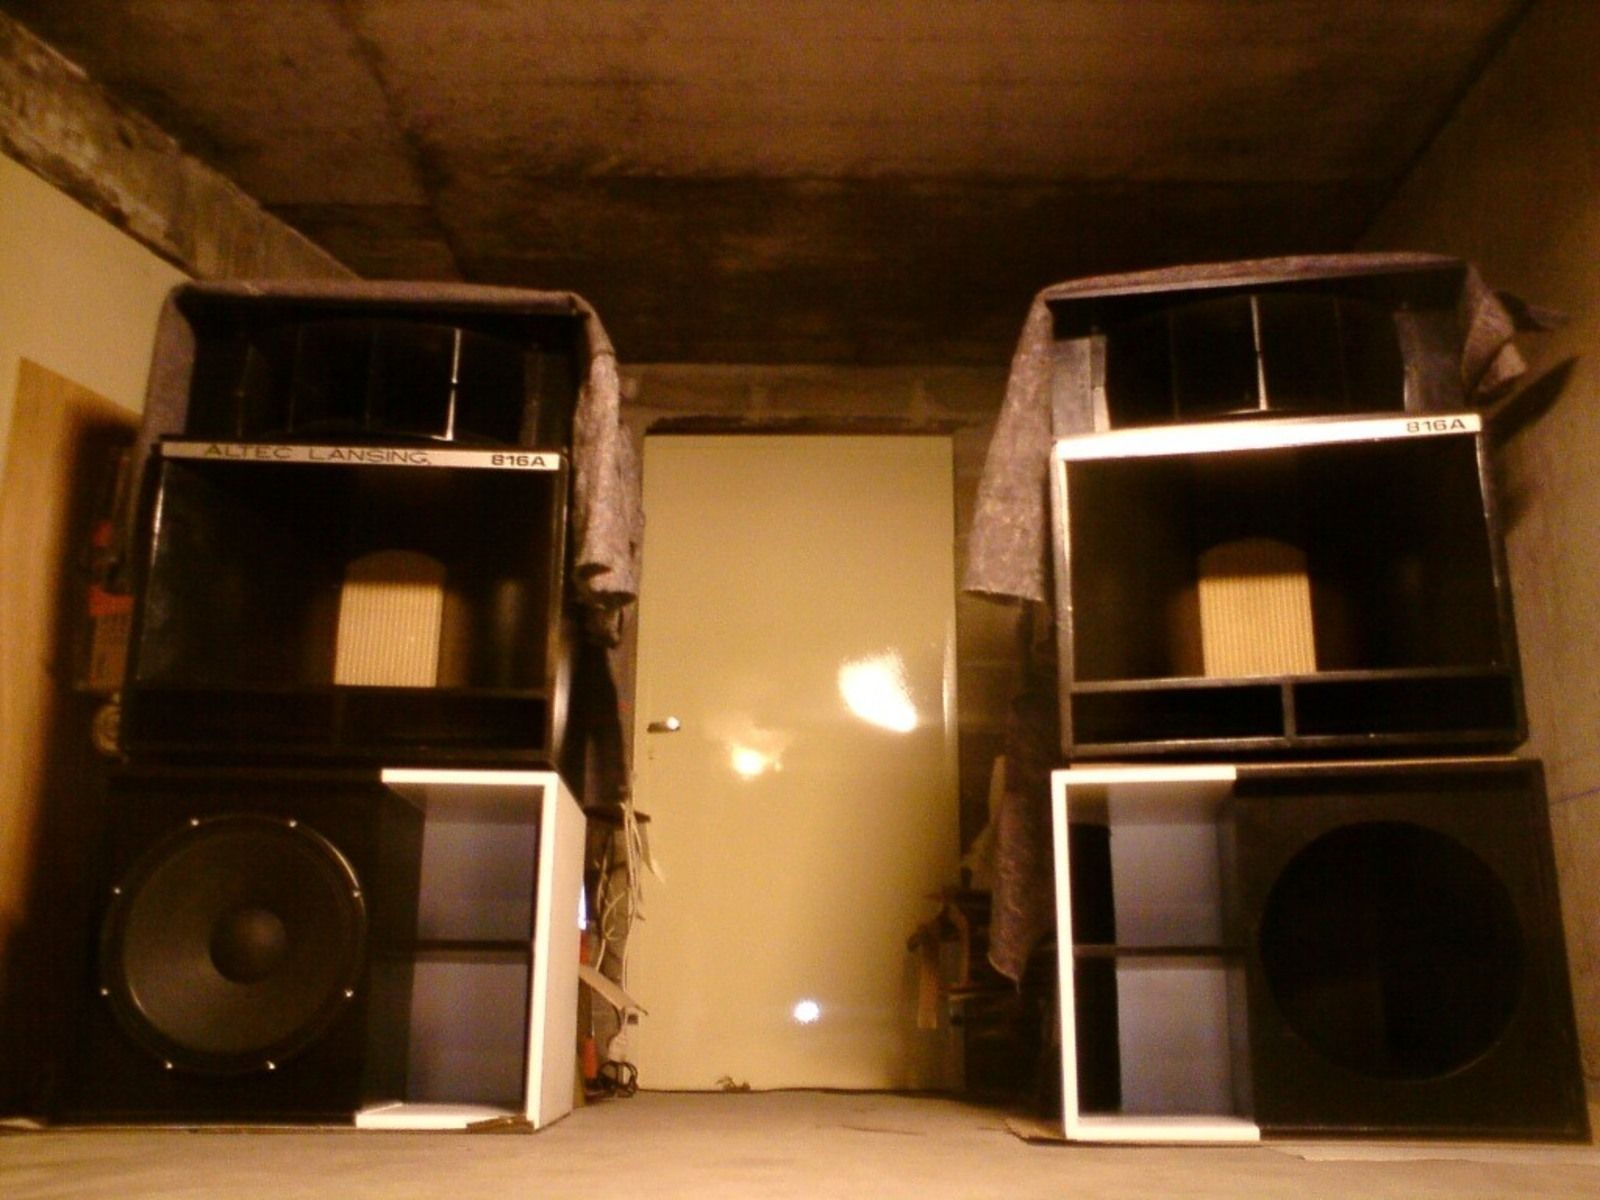 rcf esw 1018 image 26218 audiofanzine. Black Bedroom Furniture Sets. Home Design Ideas